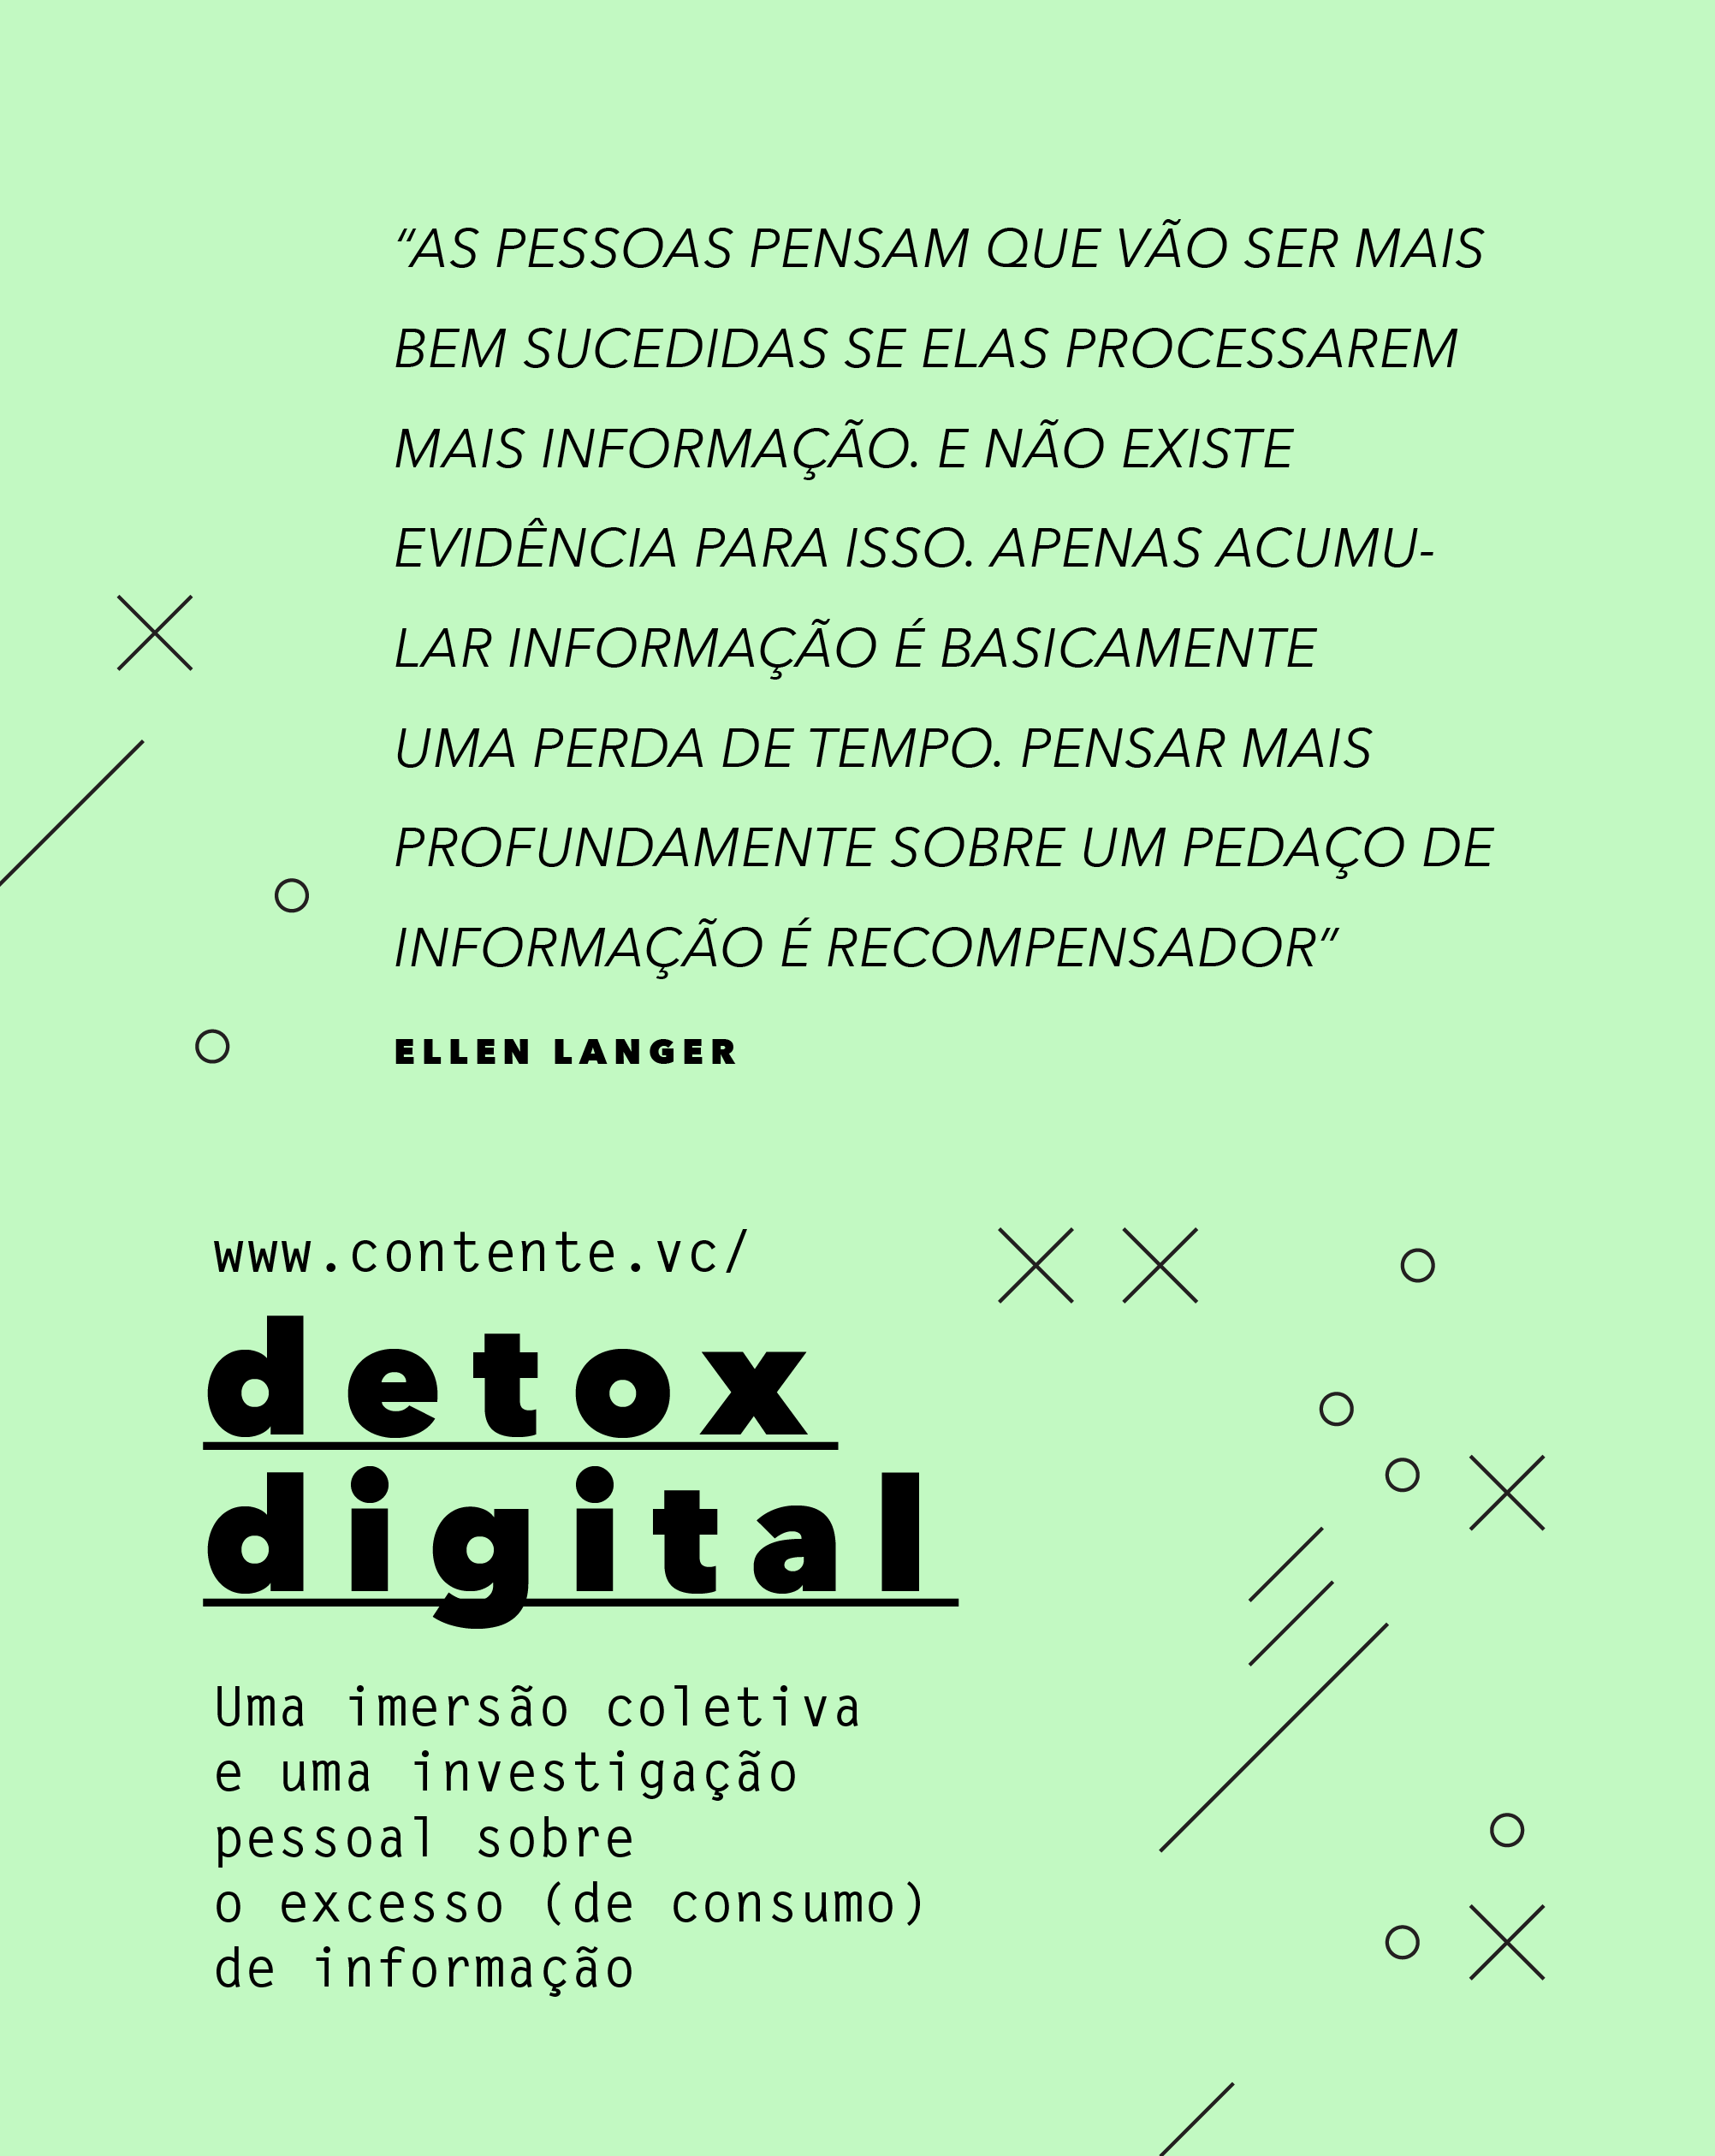 dettoxdigital-01.png